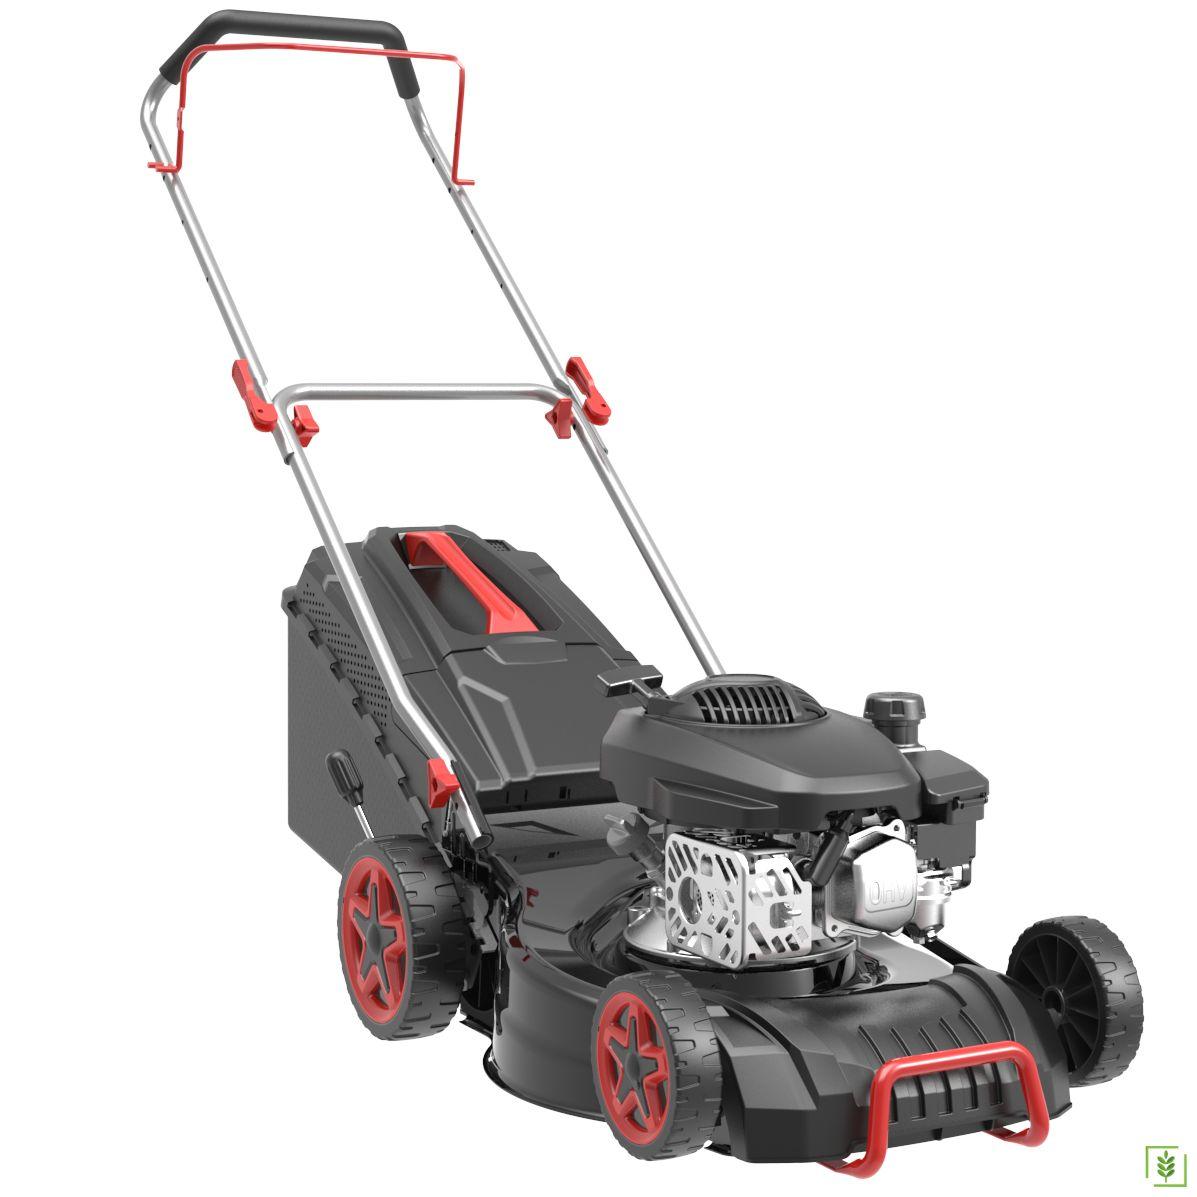 Energy DM46P-D140 Benzinli Çim Biçme Makinası